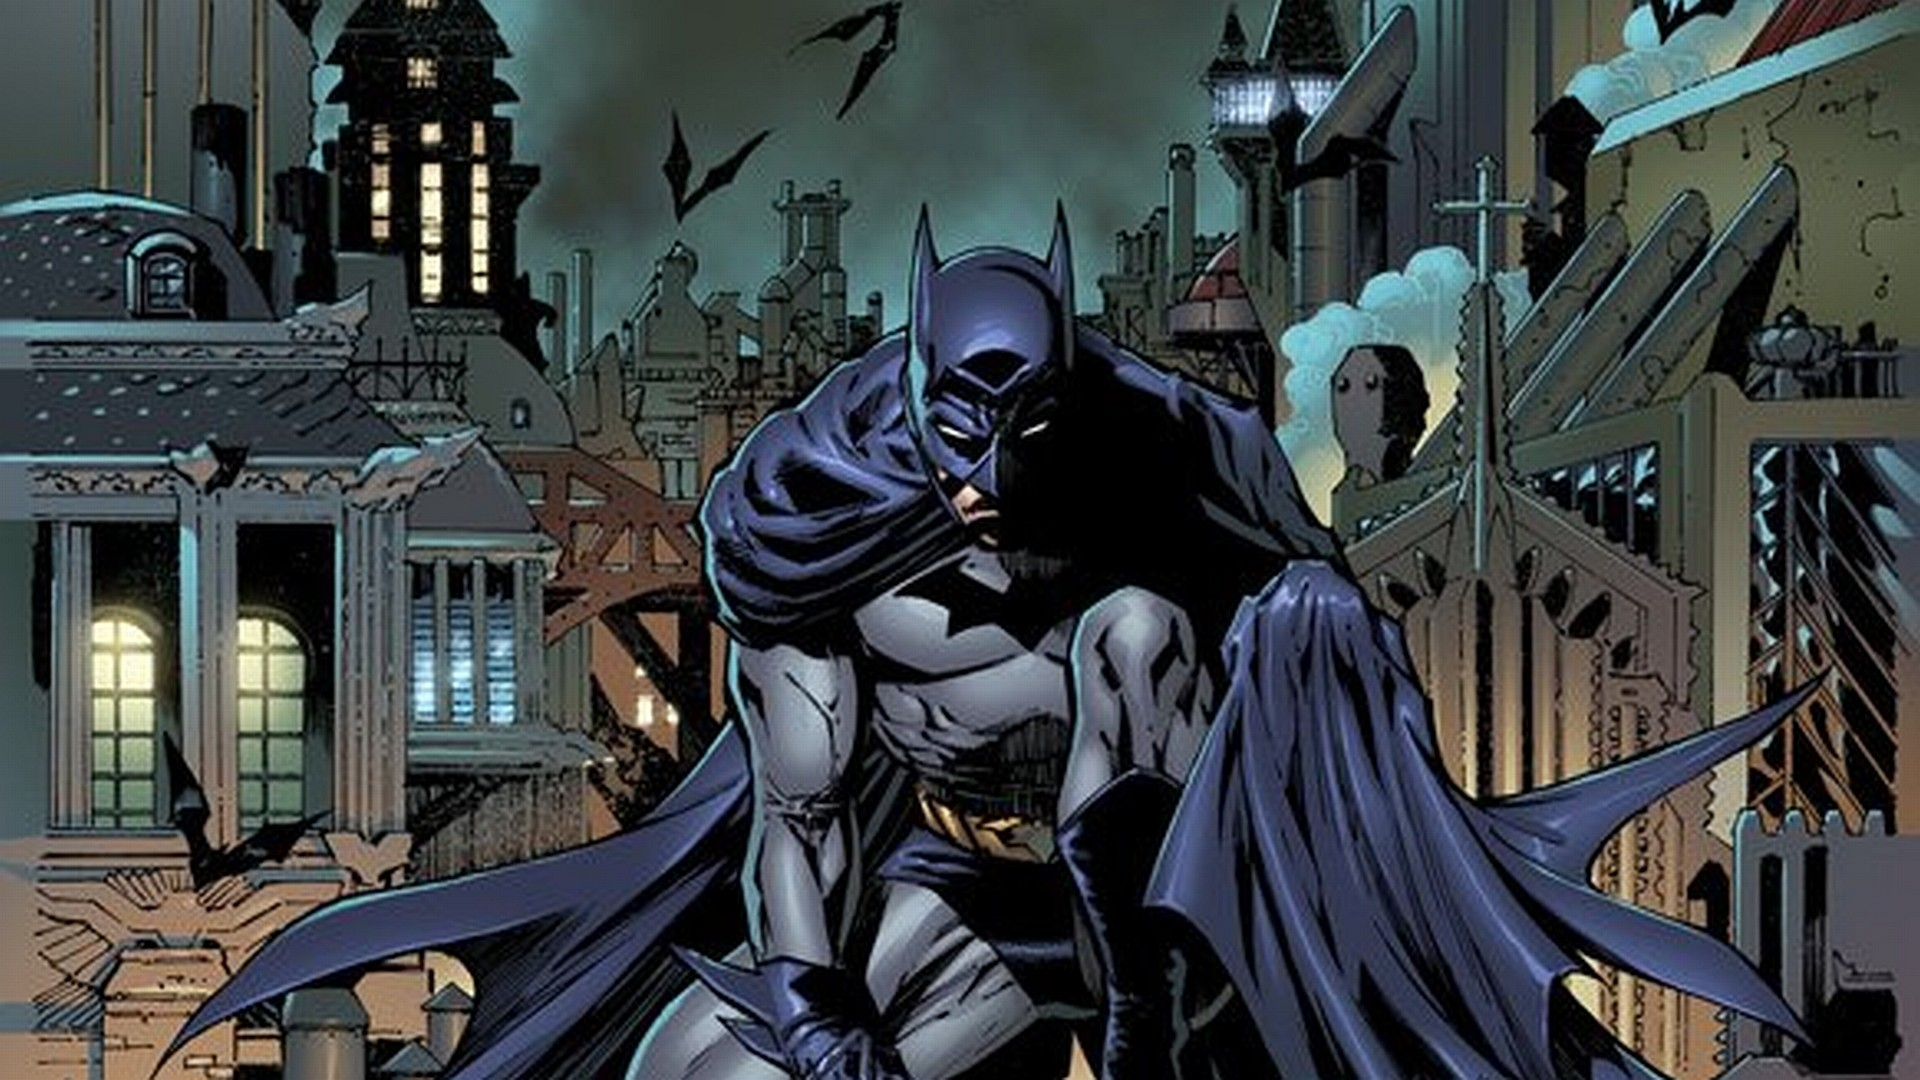 Res: 1920x1080, Batman Comic Wallpapers Picture